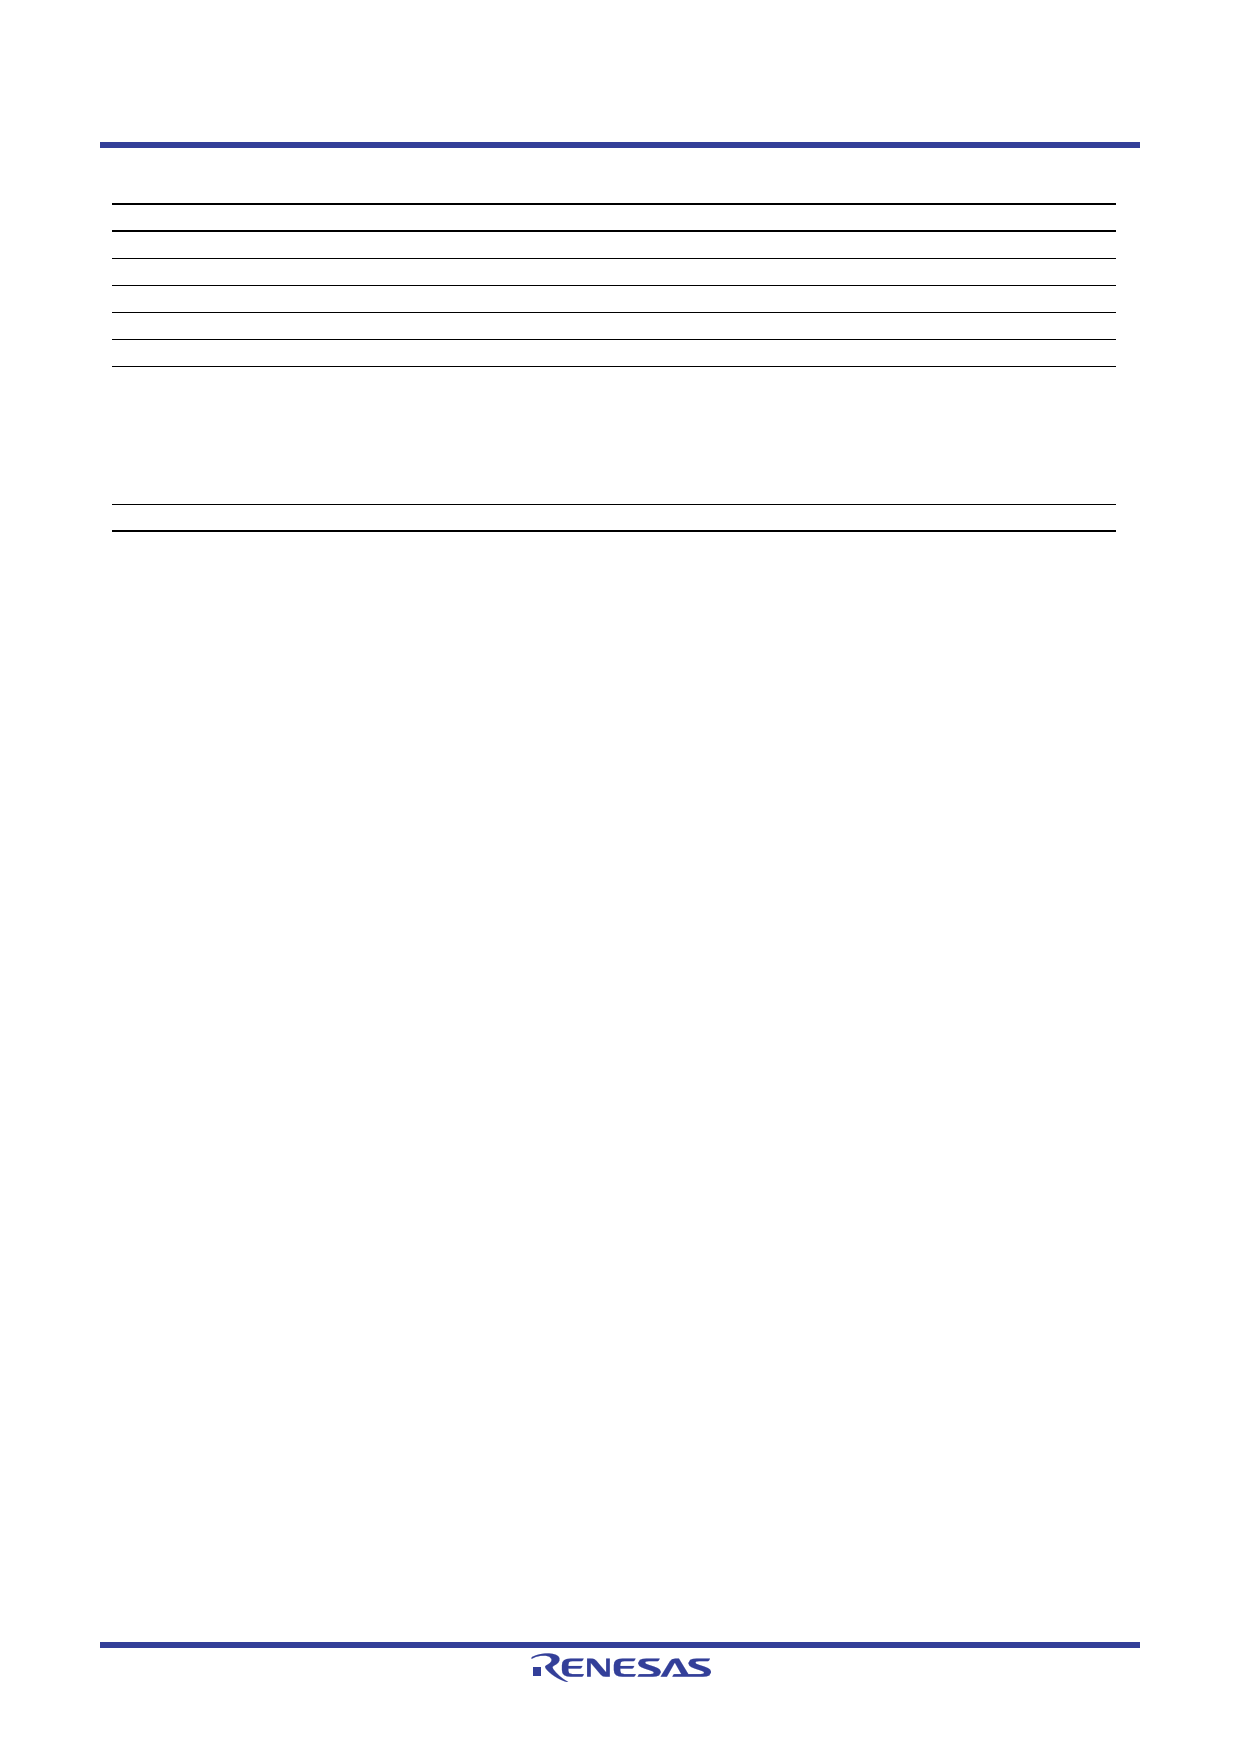 R5F51101AGFL pdf, 반도체, 판매, 대치품